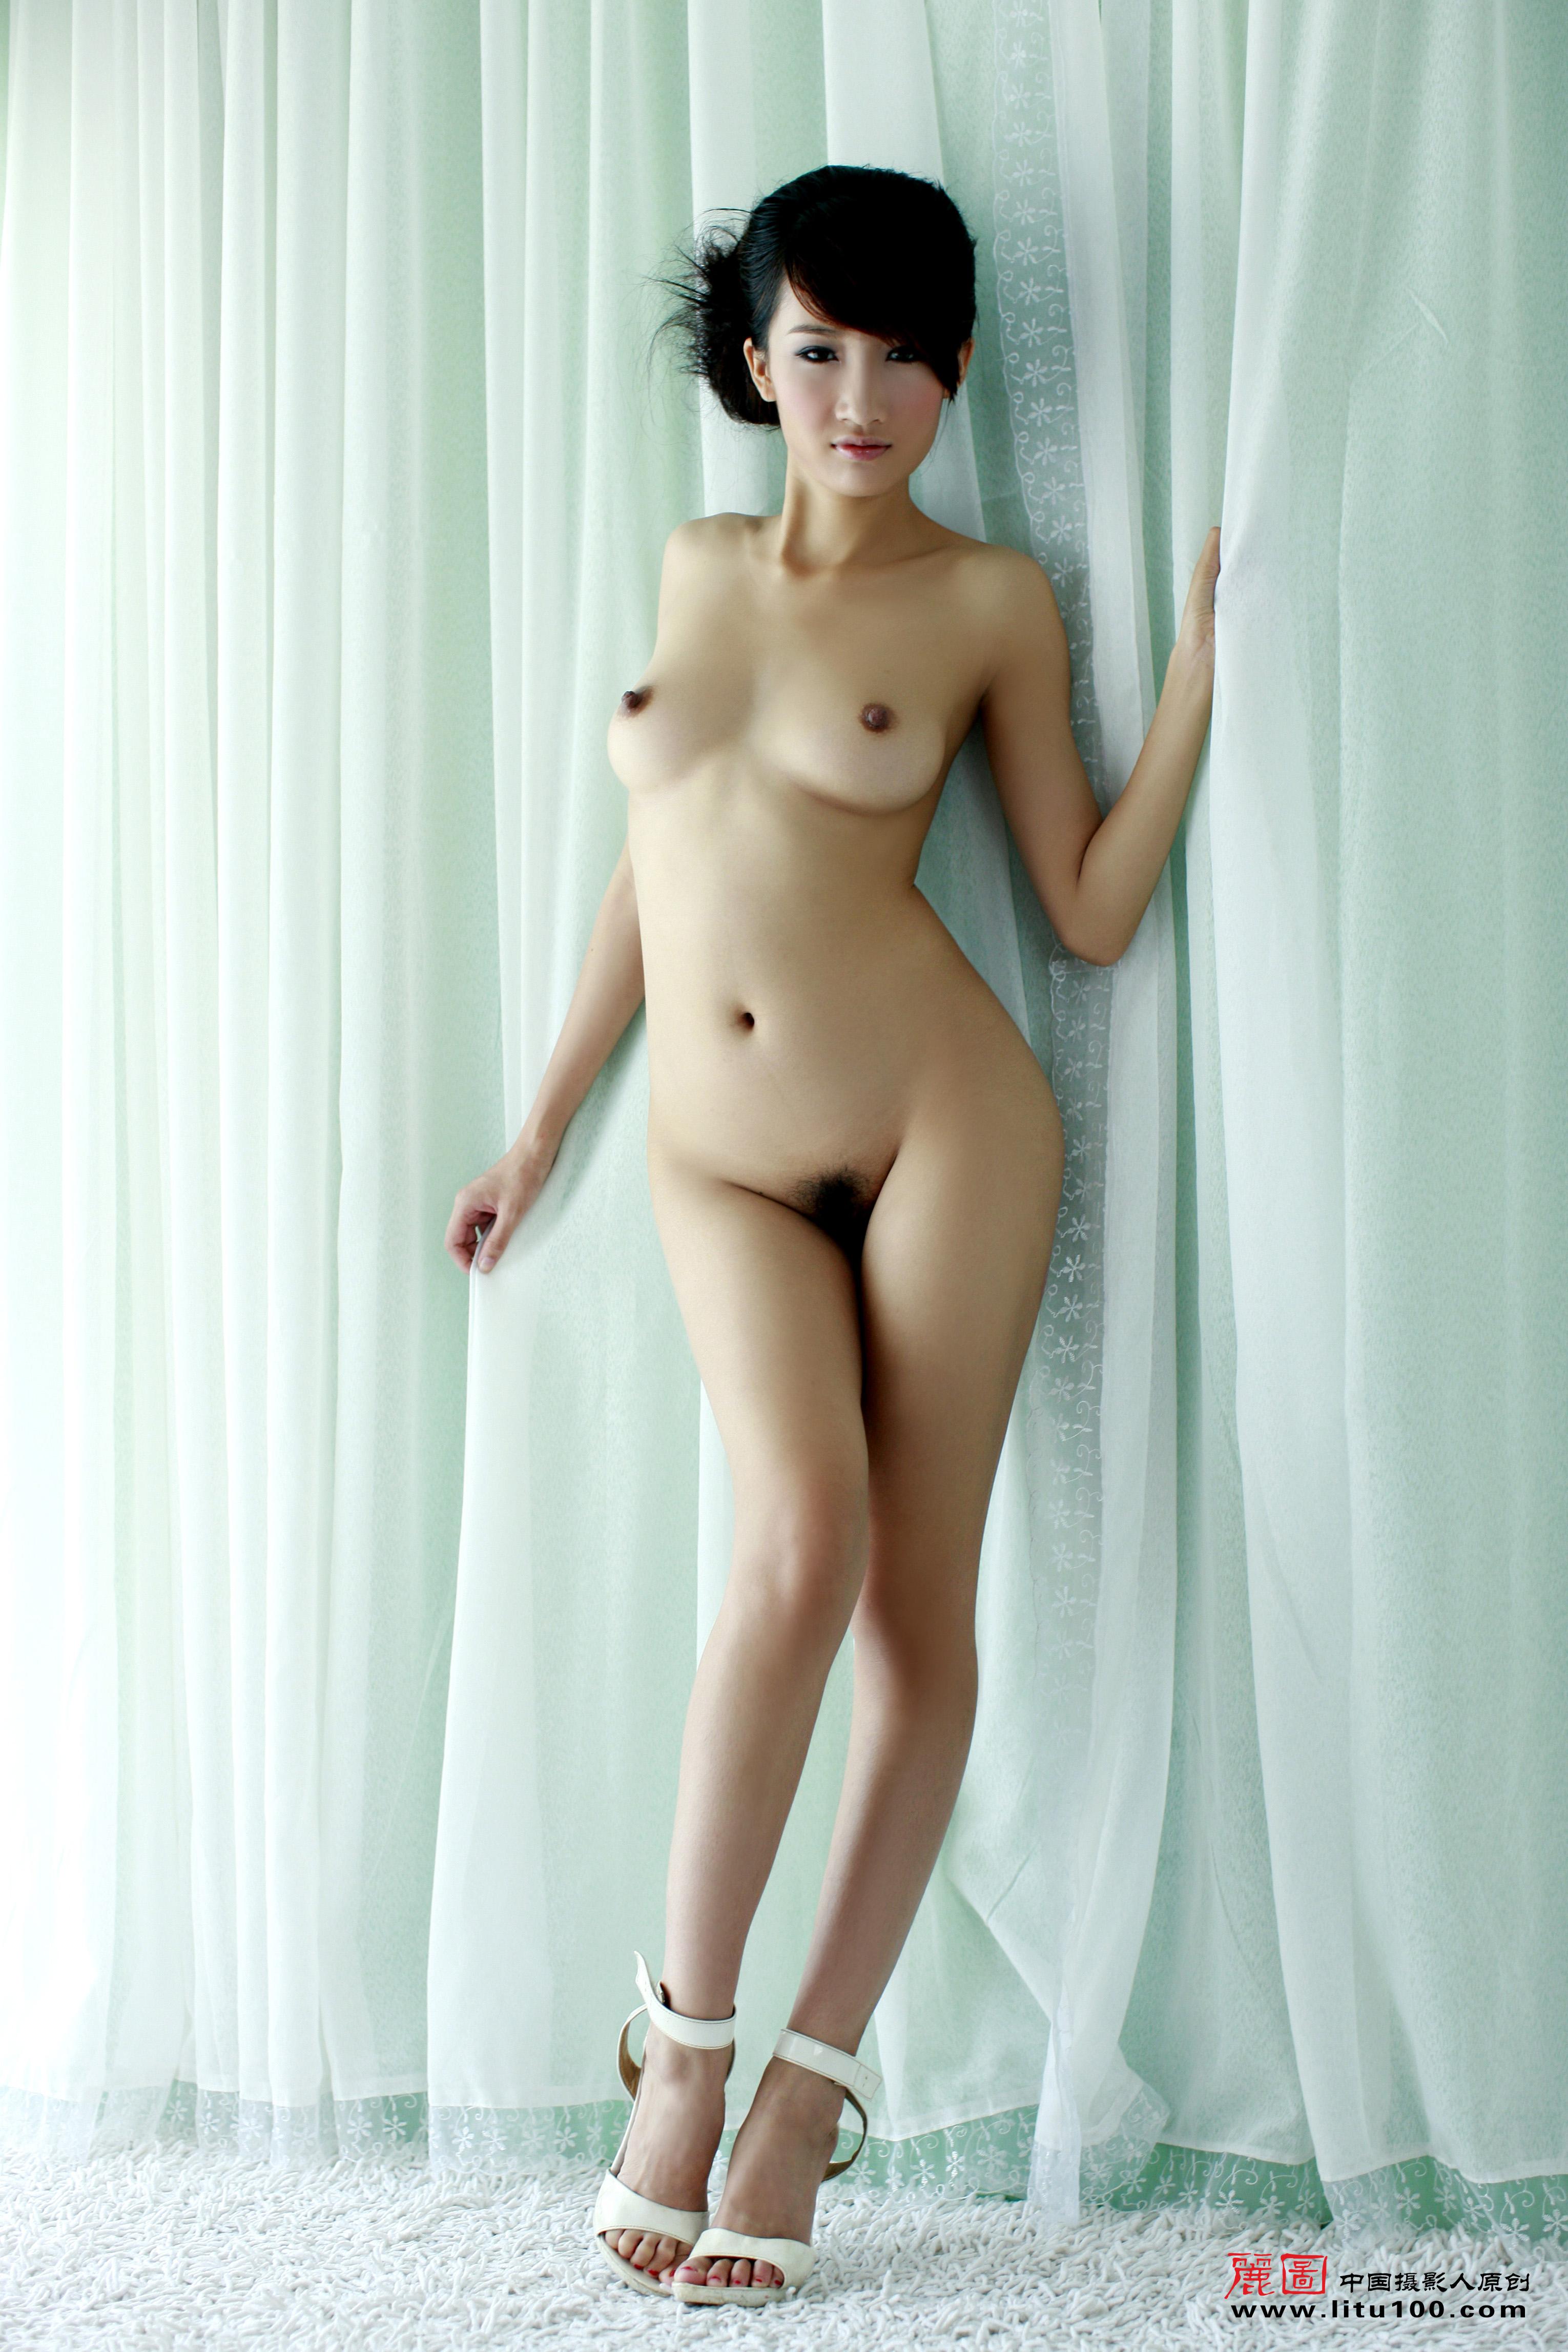 порно фото красивых якуток